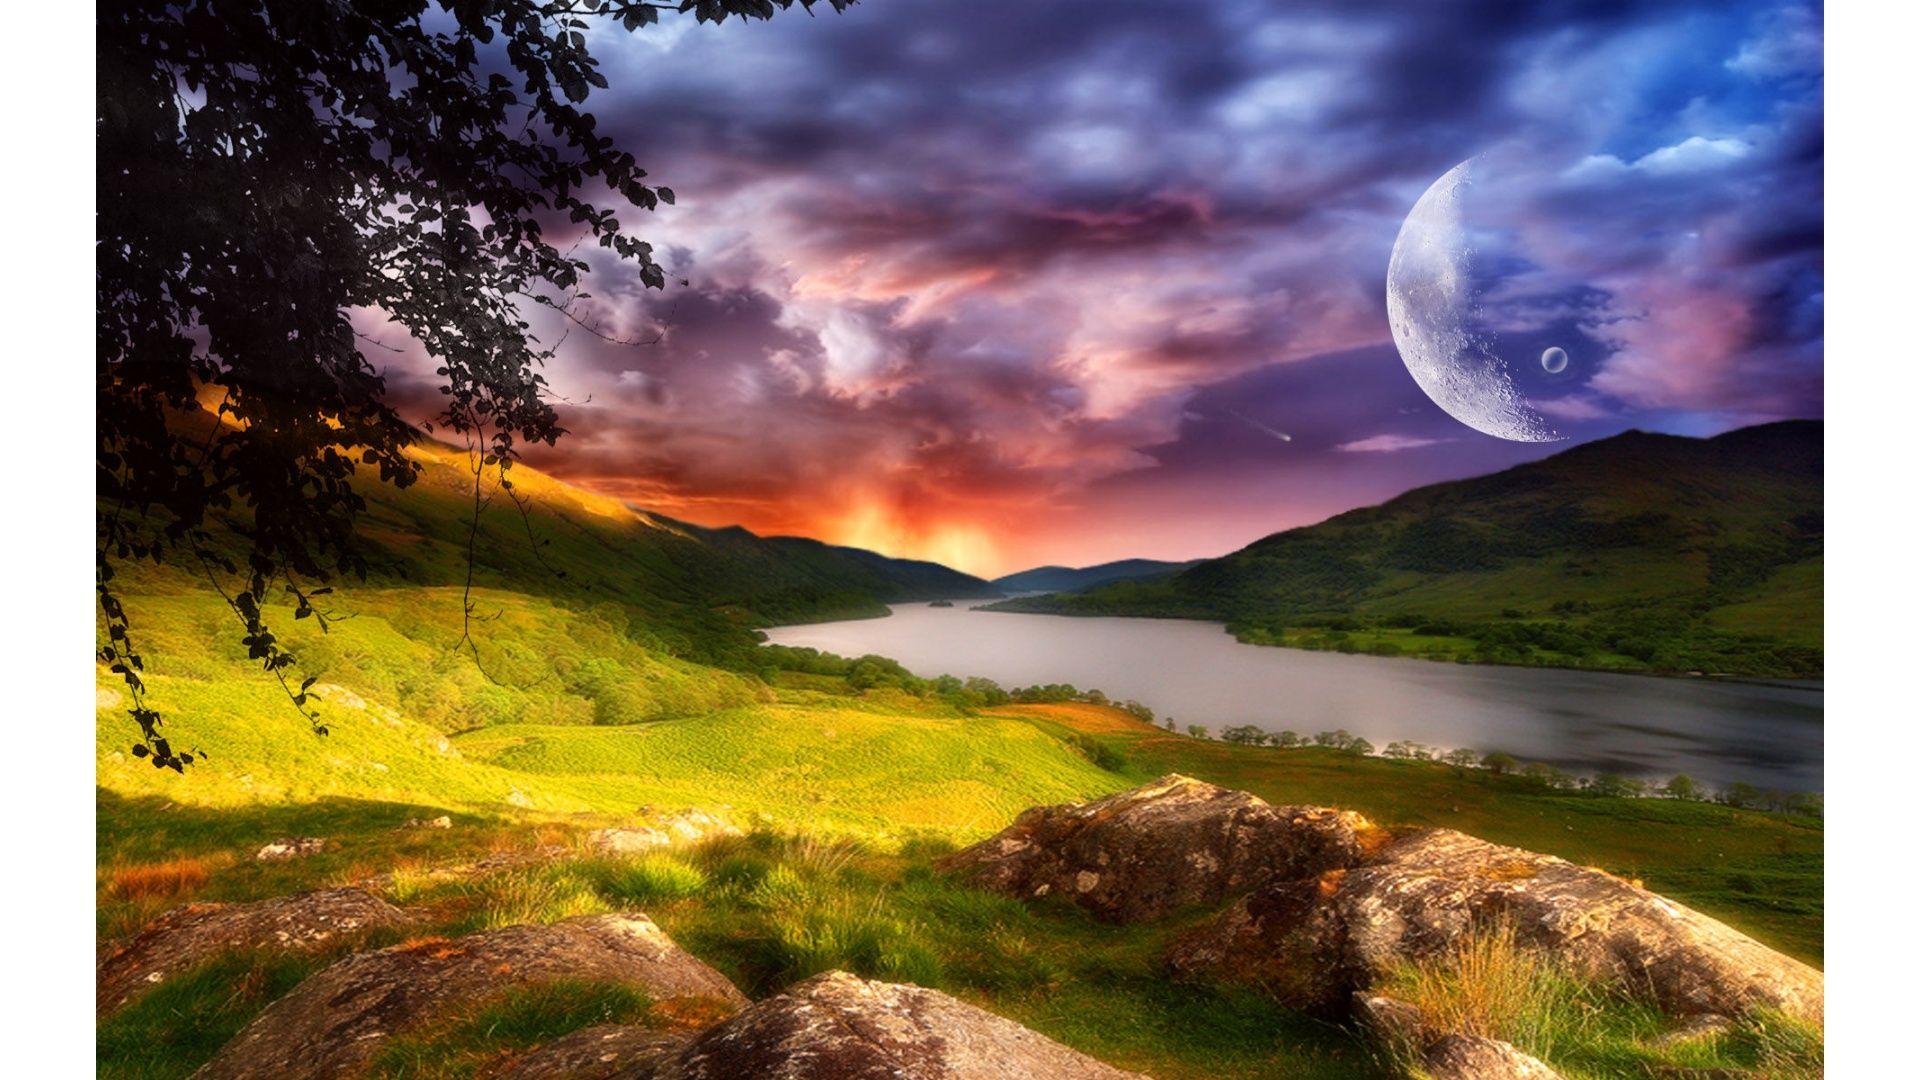 Fantasy scenery wallpaper desktop images 2k6zu3f2f5 - Fantasy scenery wallpaper ...